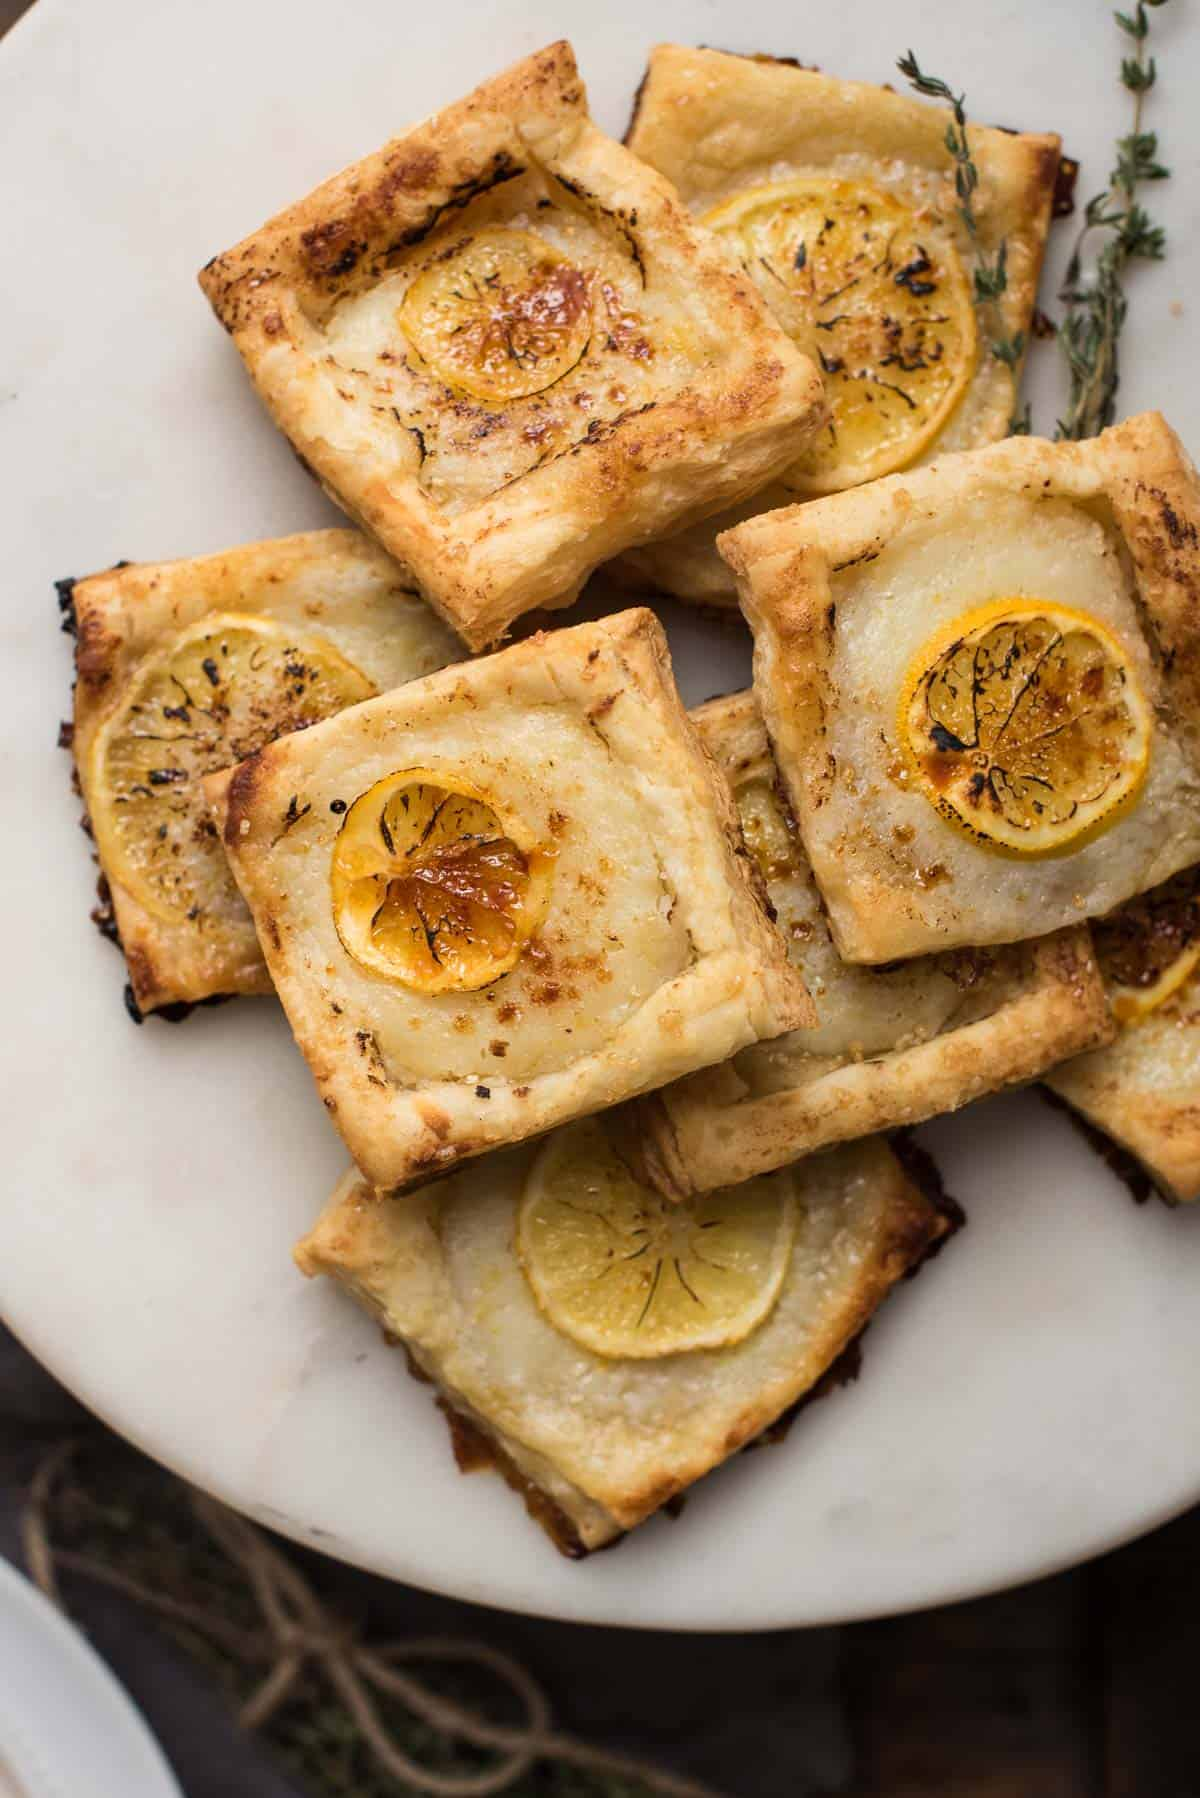 overhead view of meyer lemon ricotta pastries on a platter